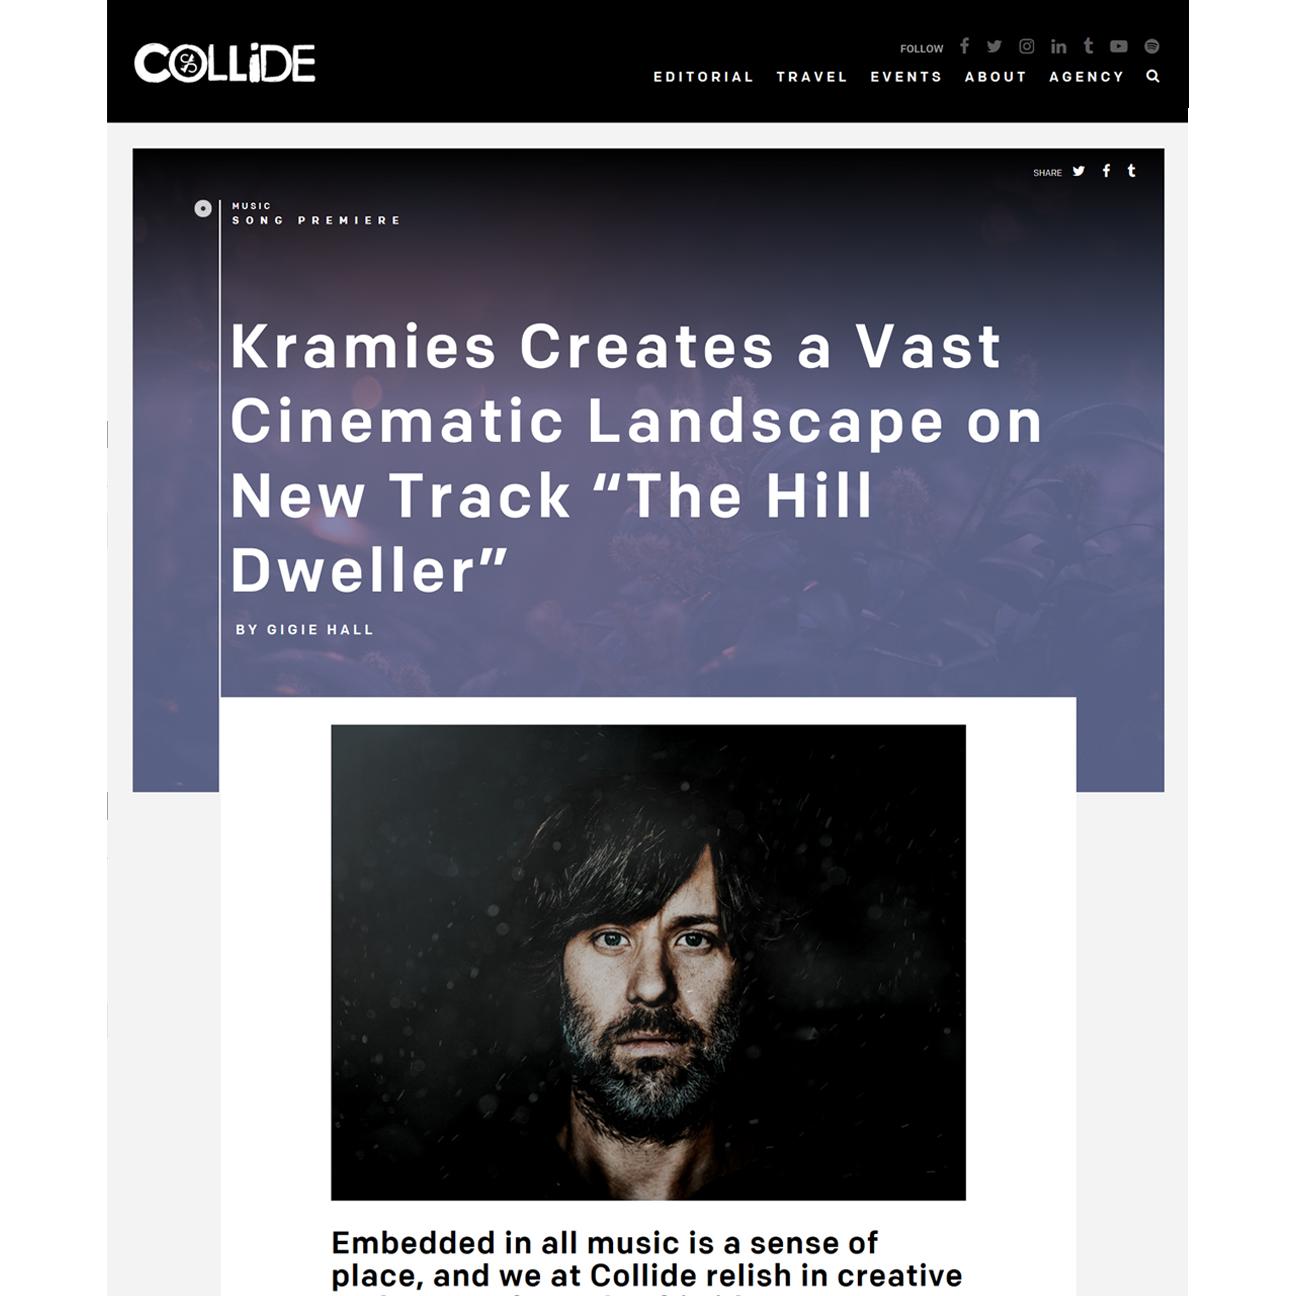 Website-SquareImages-Article_Collide.jpg